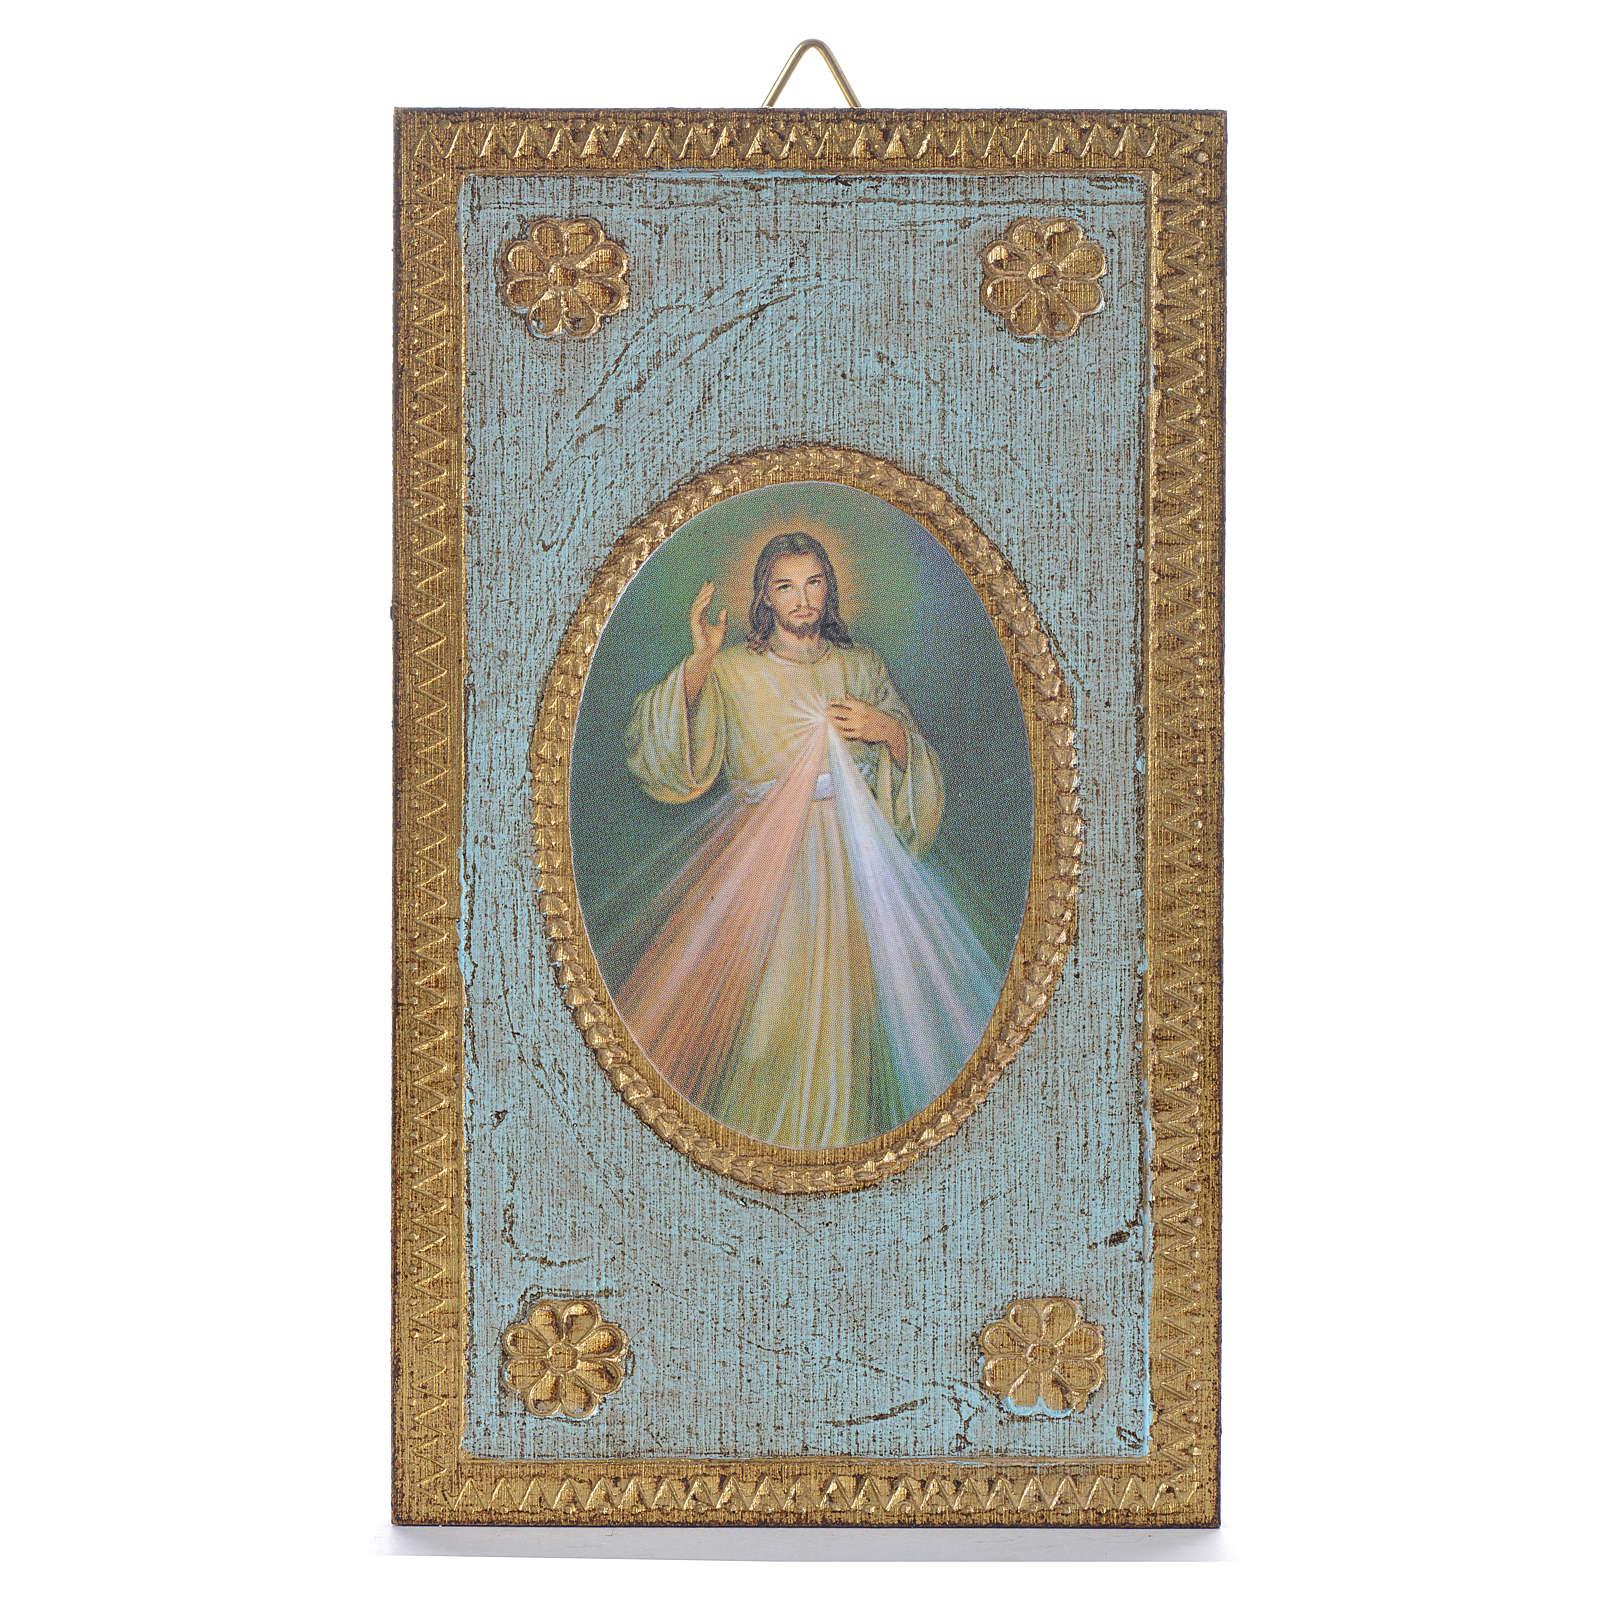 Estampa sobre madera 12,5 x 7,5 cm Divina Misericordia 3